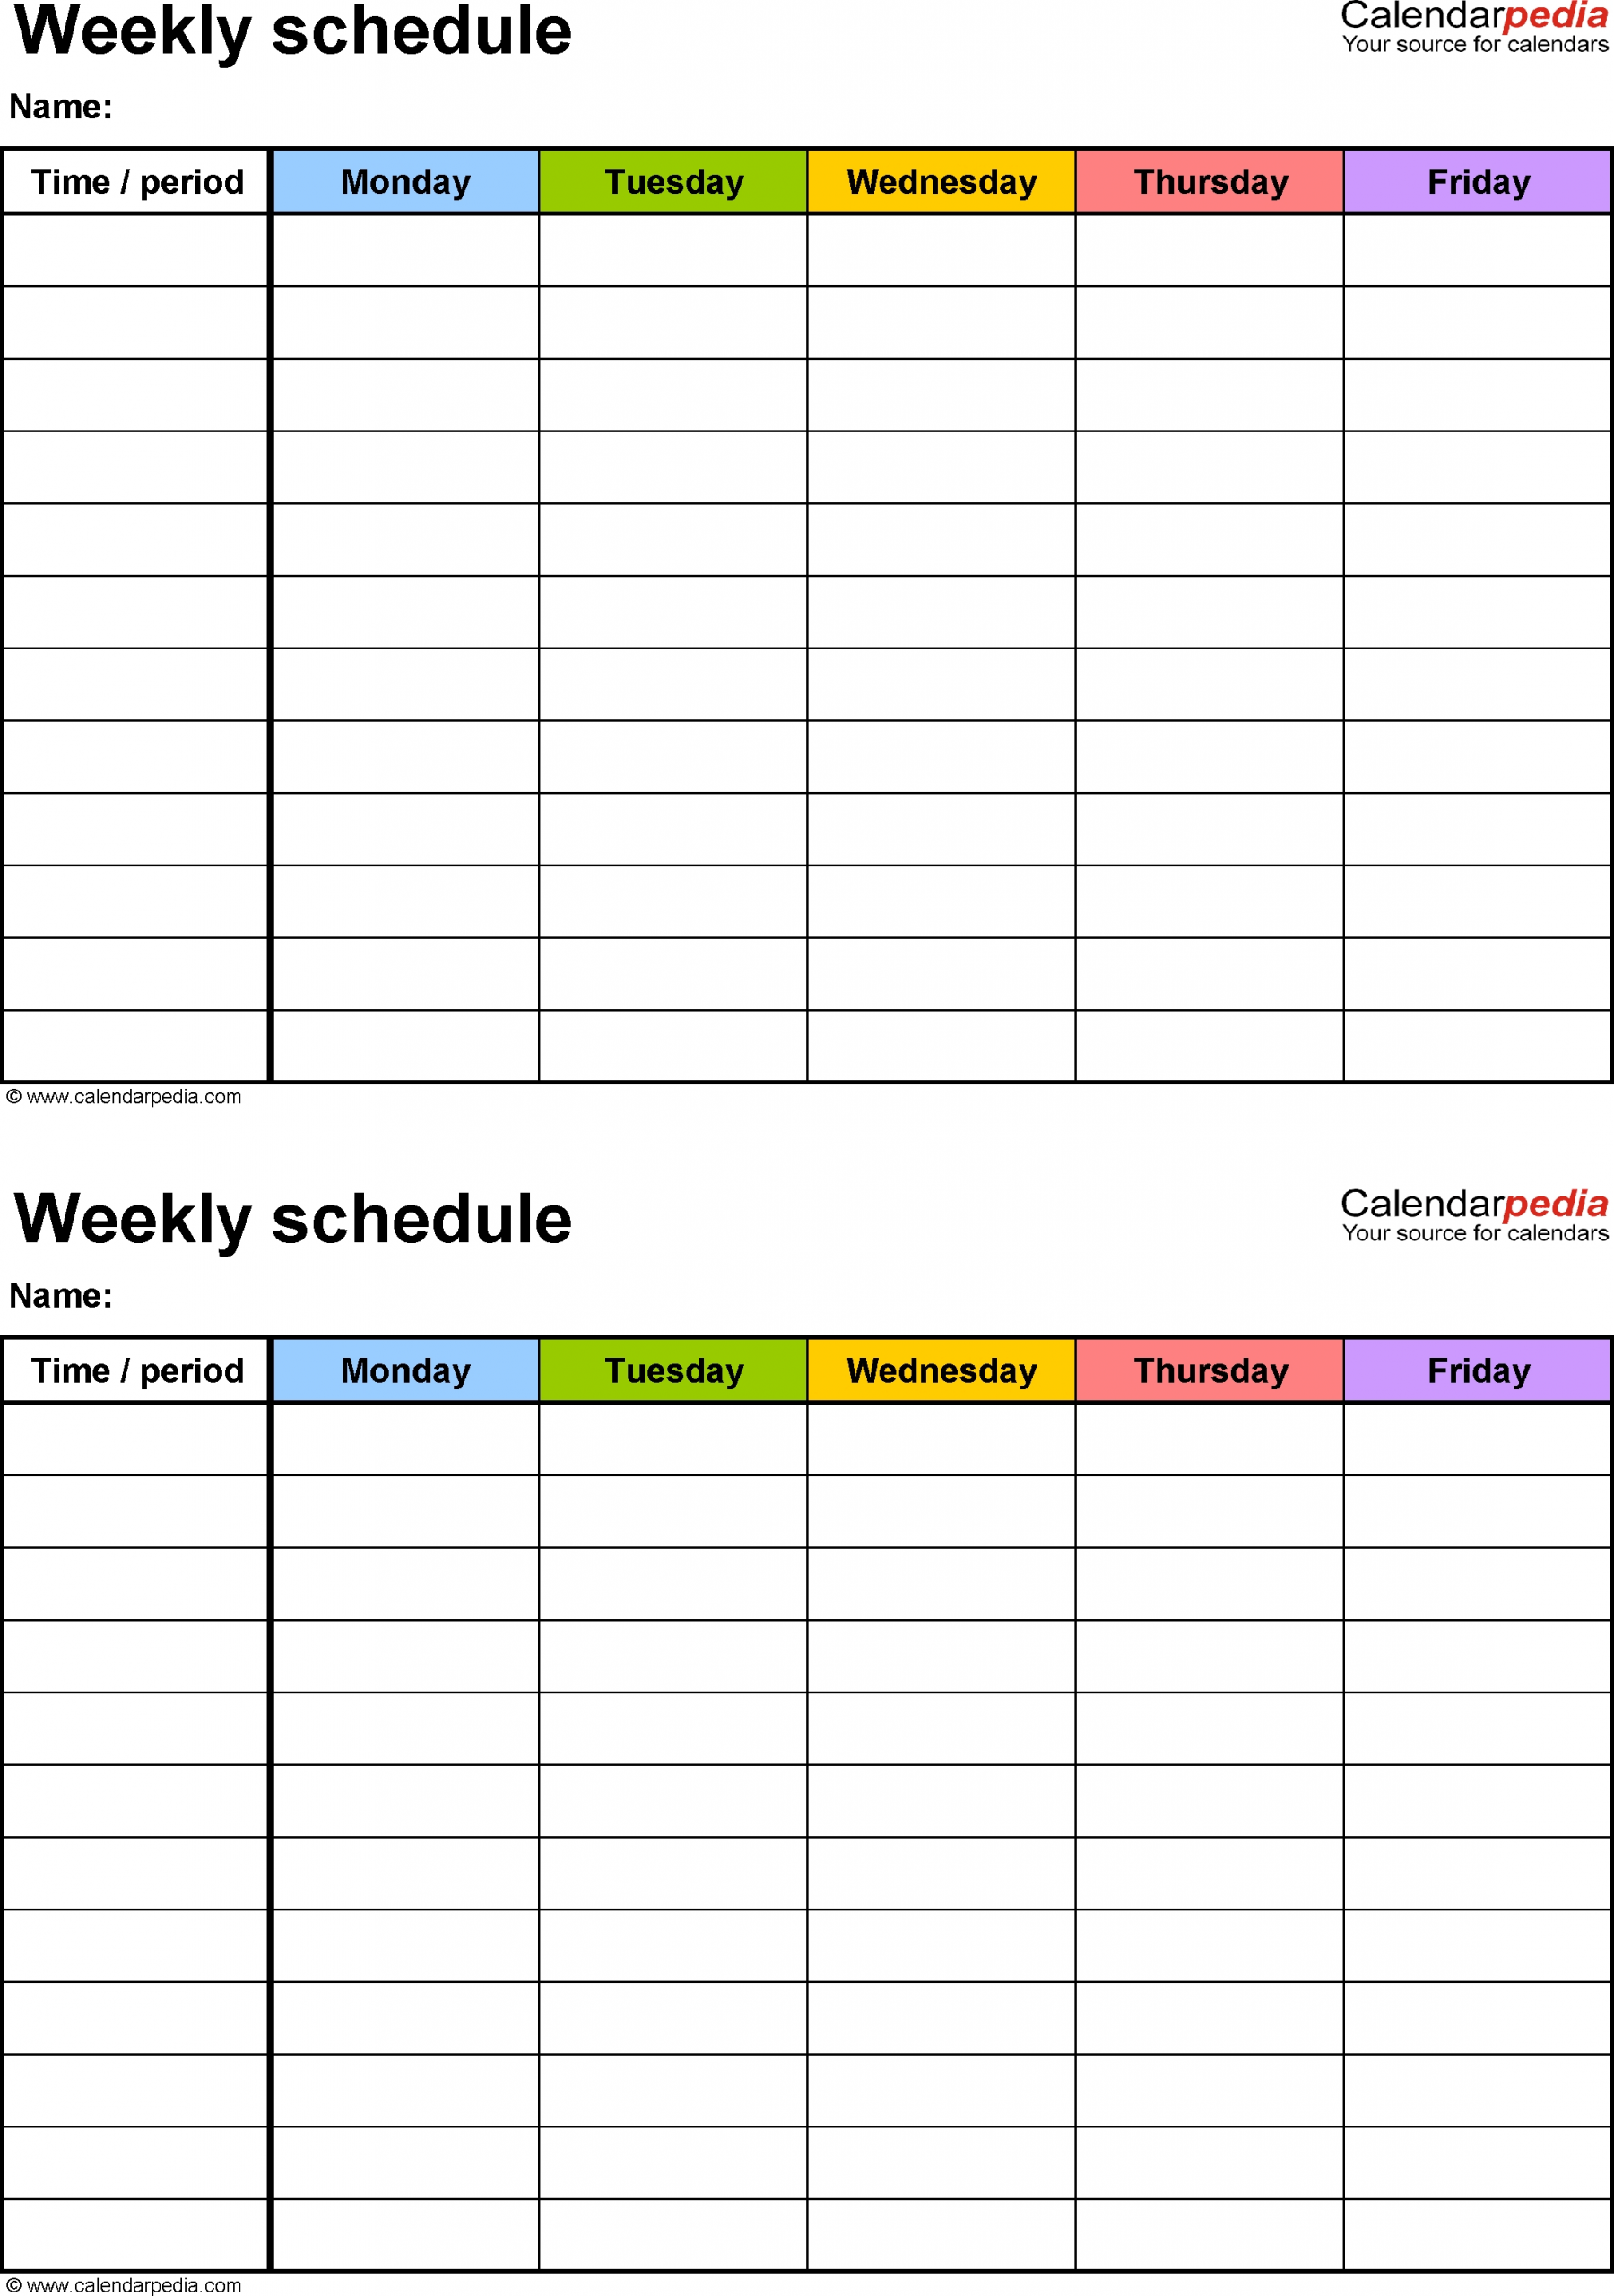 Monday To Friday 2 Week Calendar Template | Calendar Printable Two Week Calendar